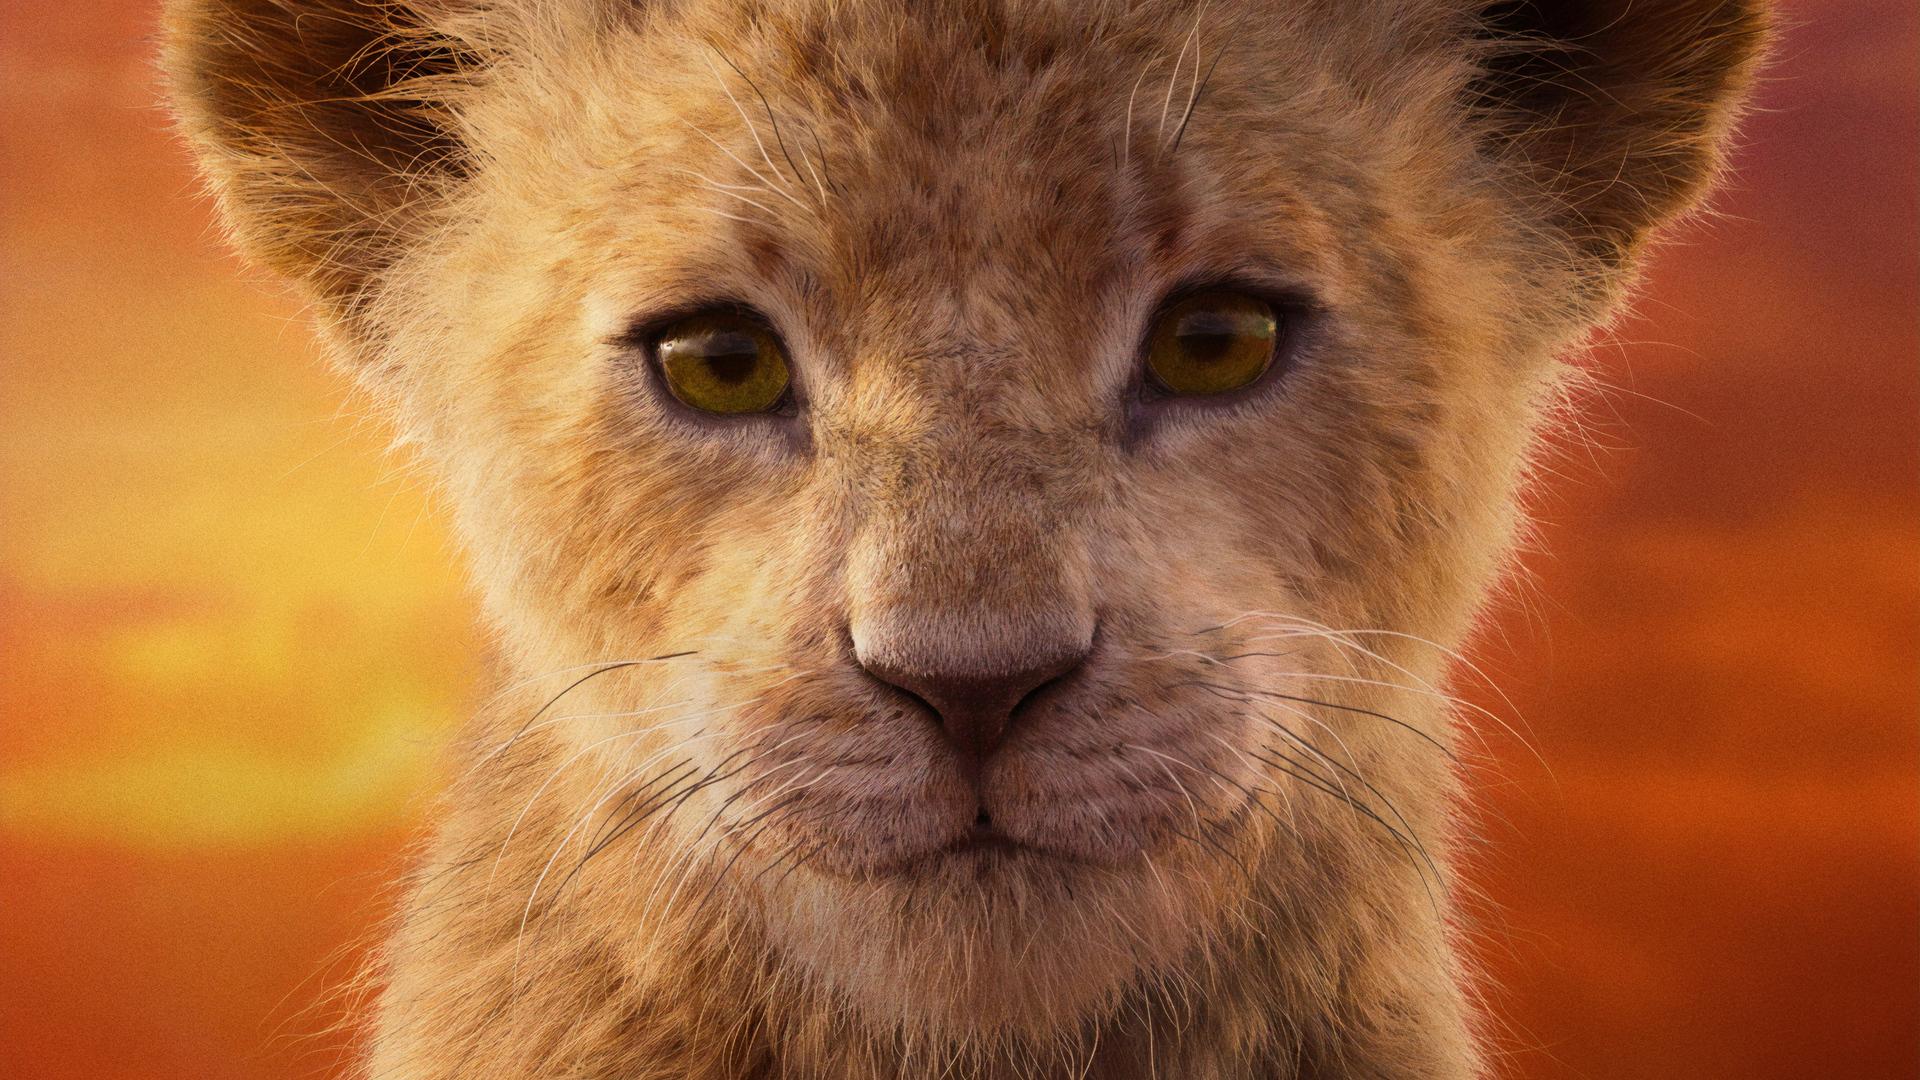 1920x1080 Shahadi Wright Joseph As Nala The Lion King 2019 4k Laptop